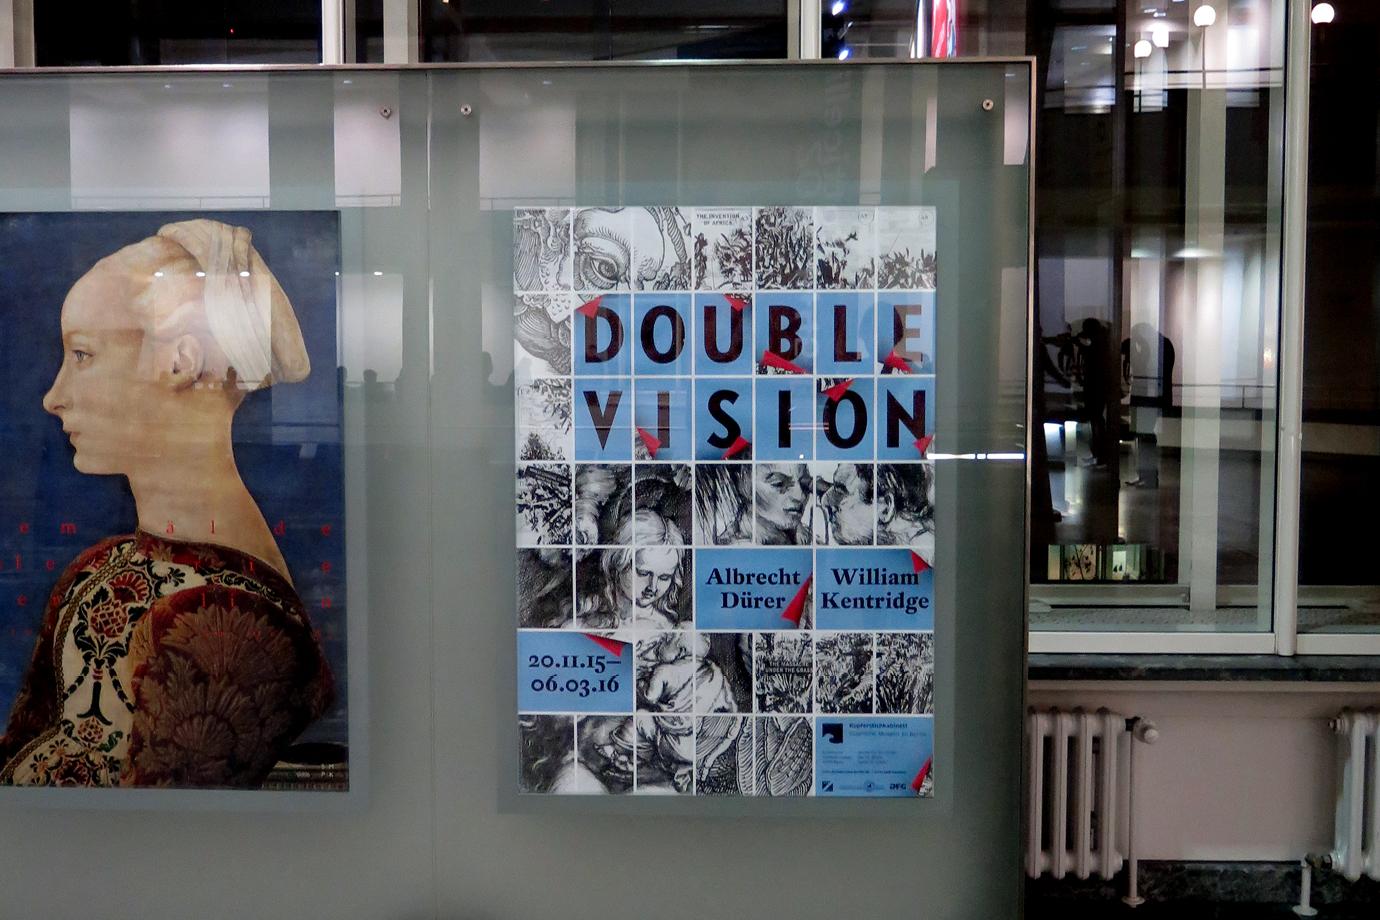 http://e-o-t.de/wordpress/wp-content/uploads/2017/01/2014_eot-DoubleVision-Poster-03.jpg